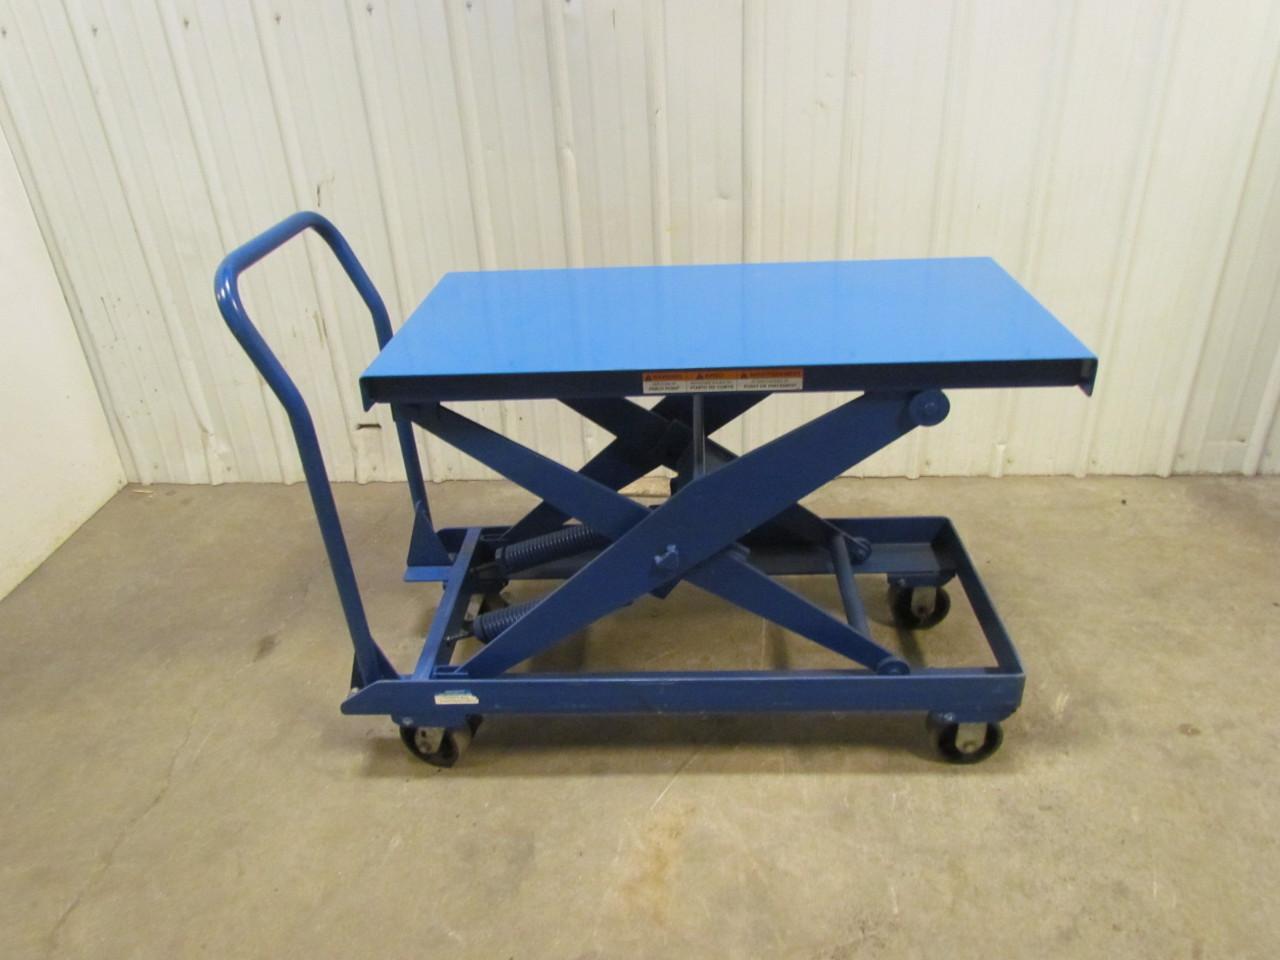 heavy duty self leveling scissor lift cart 20 x40 table size 32 height ebay. Black Bedroom Furniture Sets. Home Design Ideas